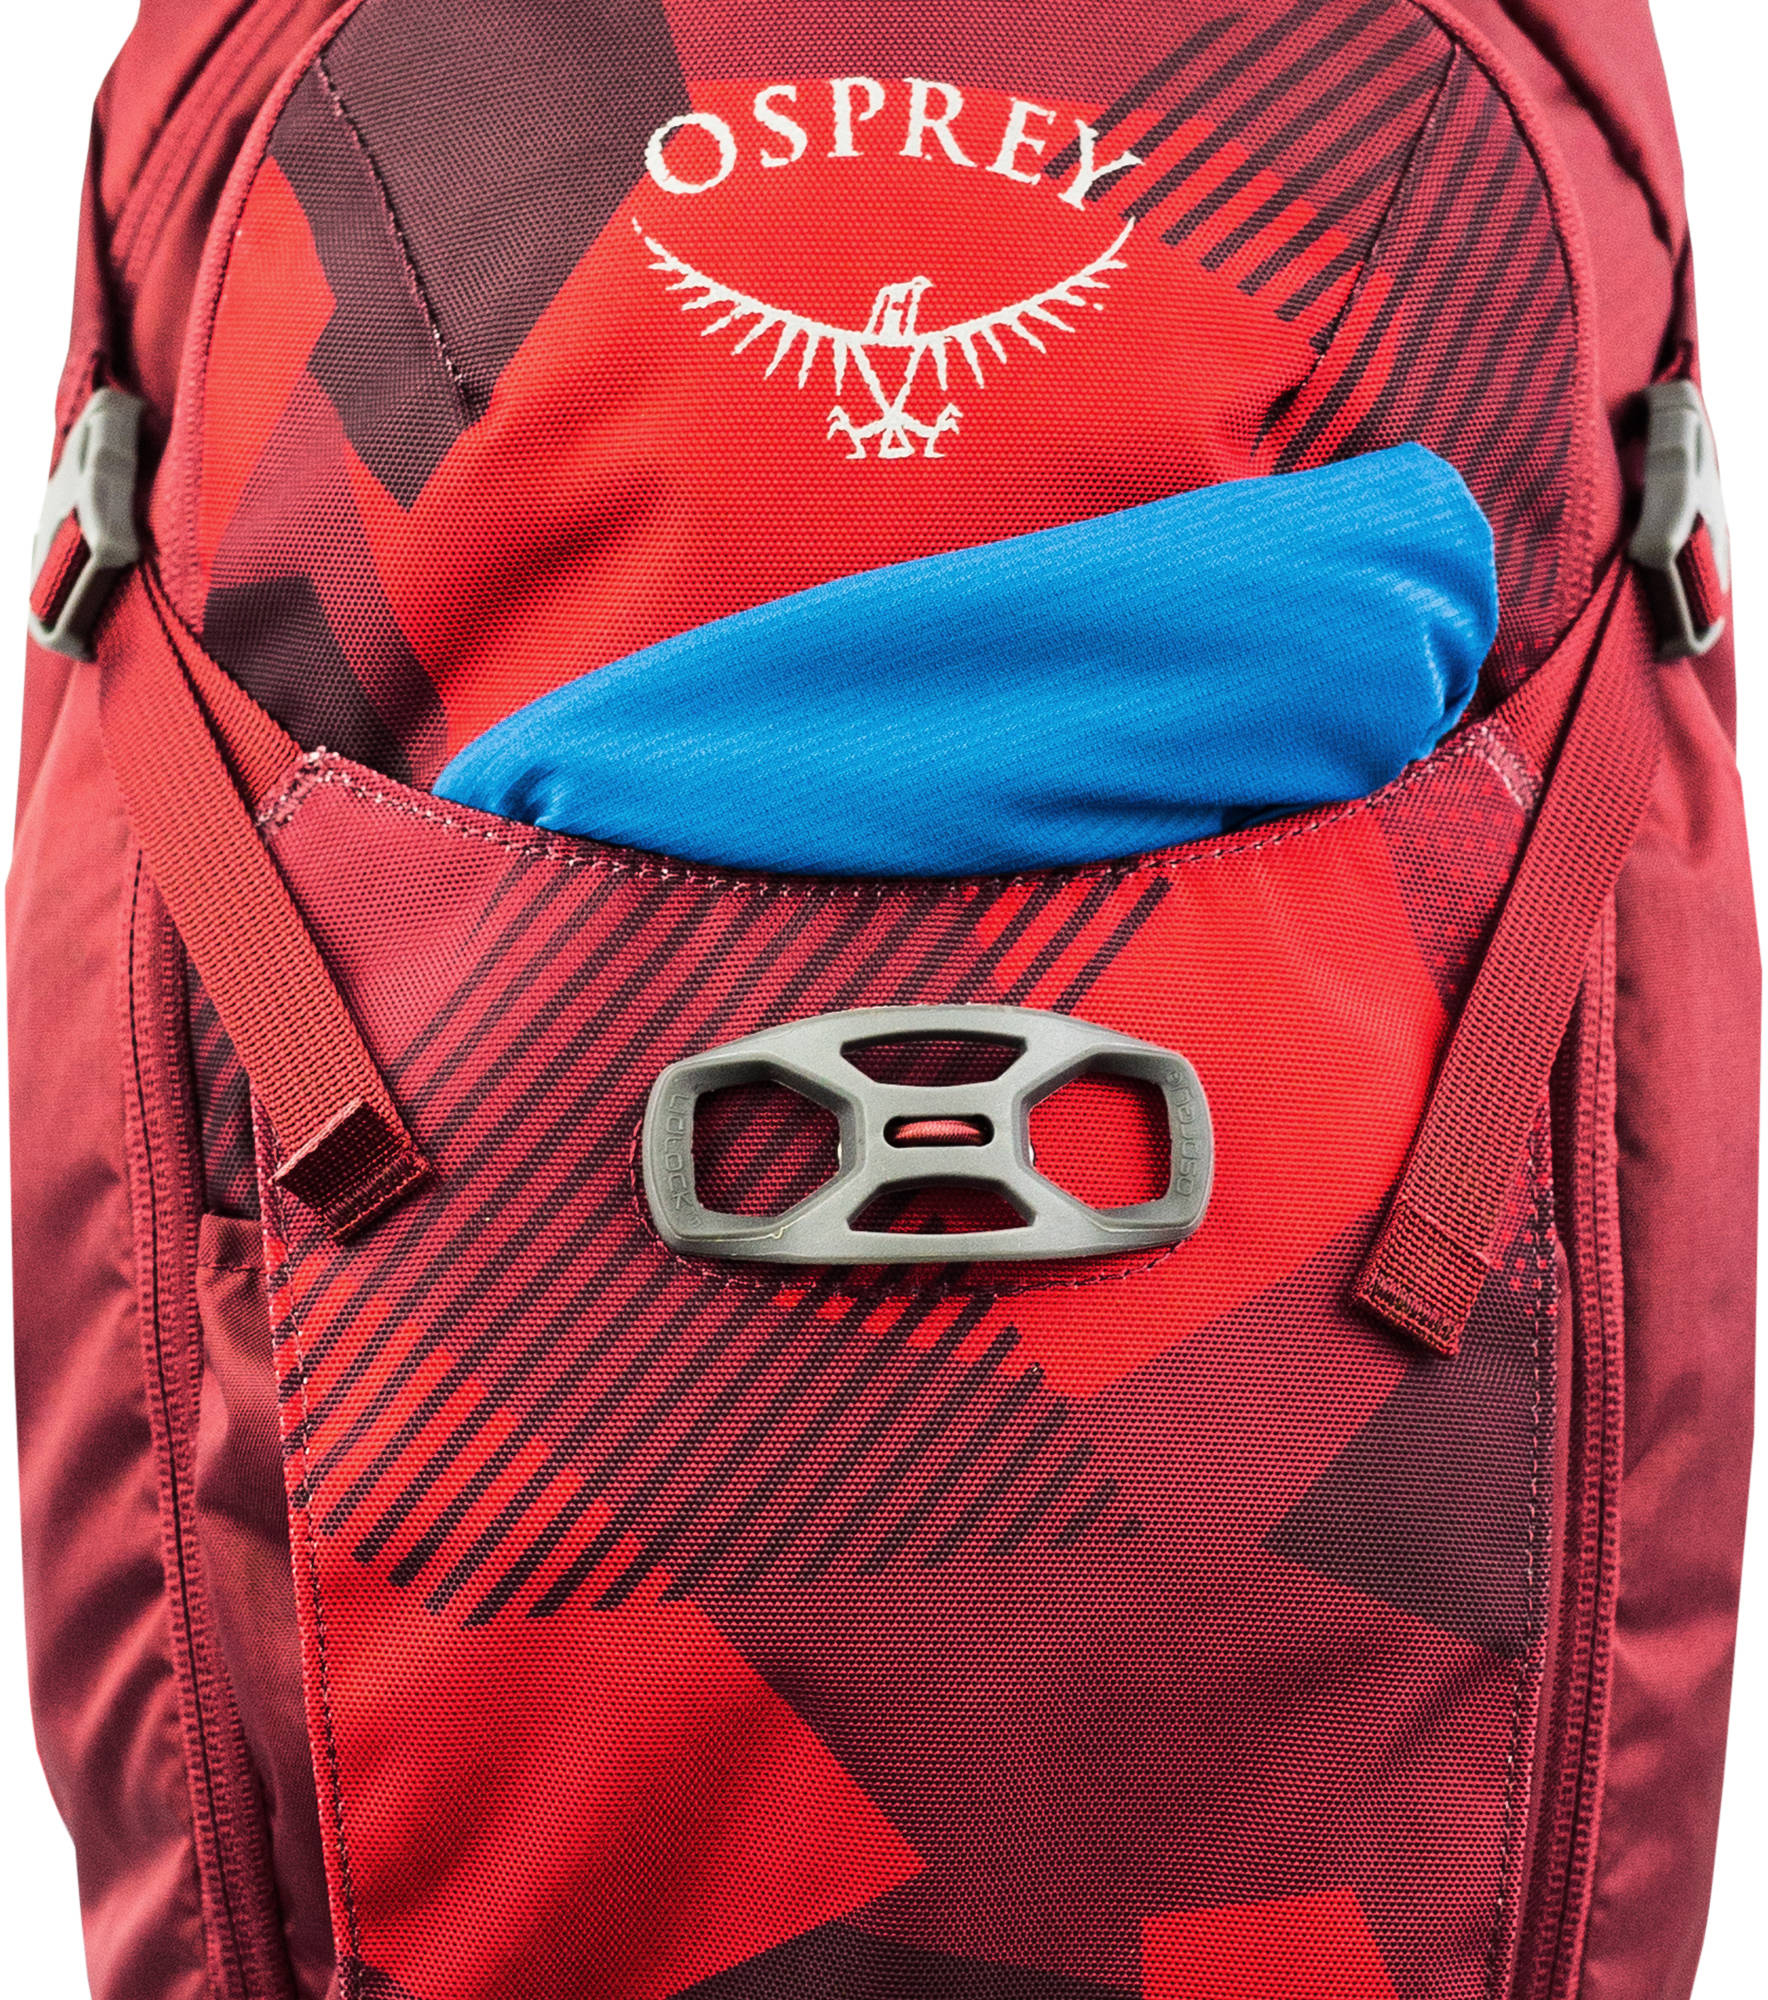 0e1f7dc85912 Рюкзак велосипедный Osprey Siskin 8 Obsidian Black